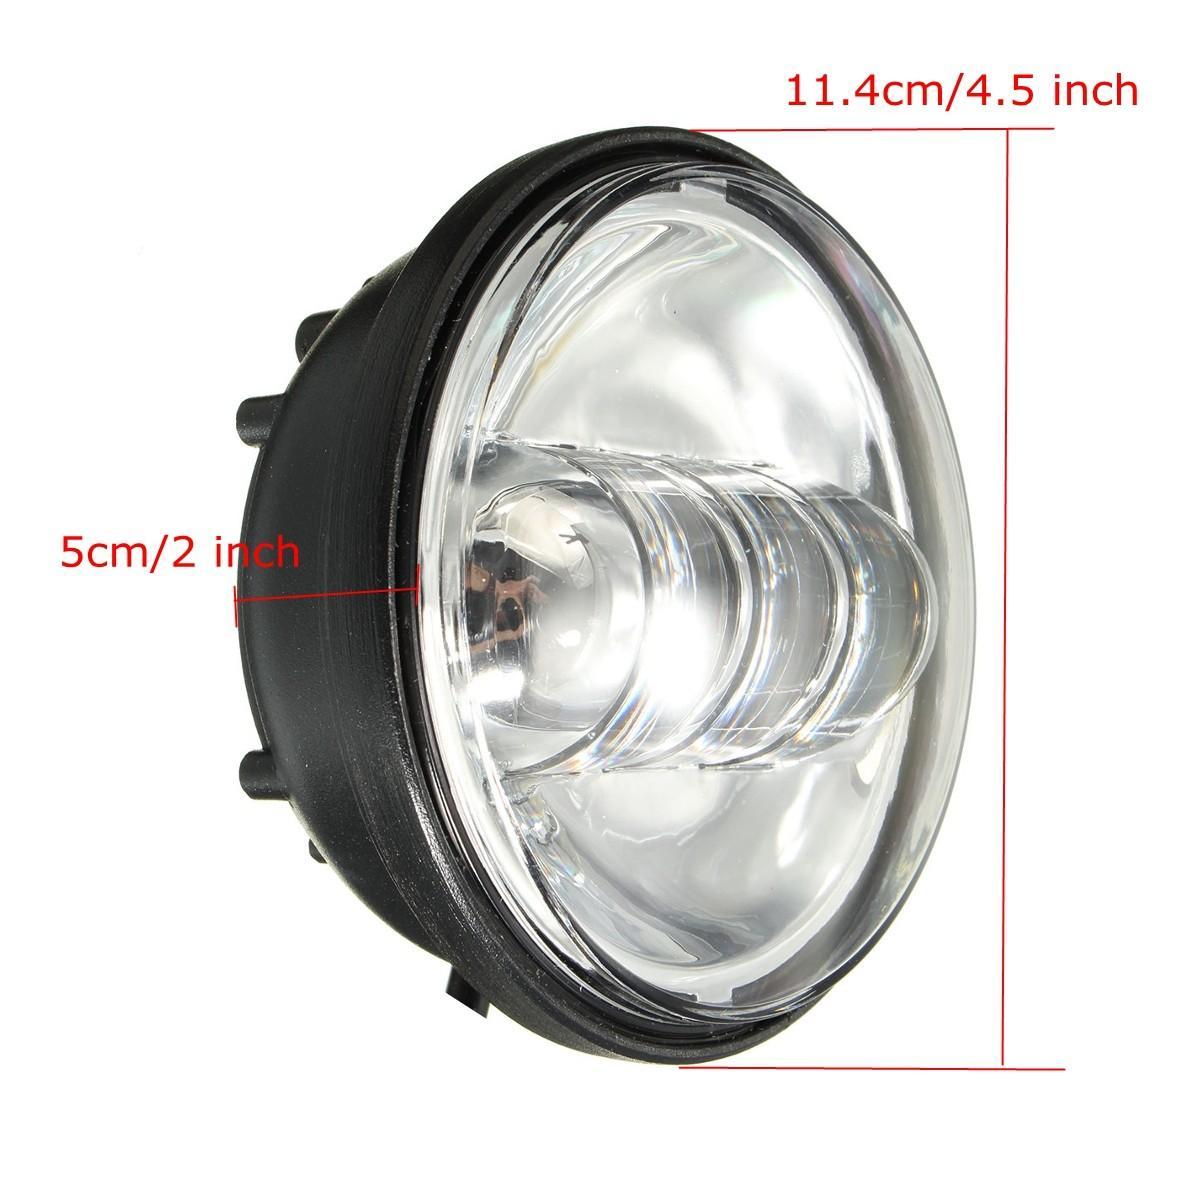 Fitur 2 Pcs 4 5 Inch Chrome Led Auxiliary Fog Melewati Lampu Terang 2pcs Mata T10 Untuk Motor Merah 45 Harley Intl